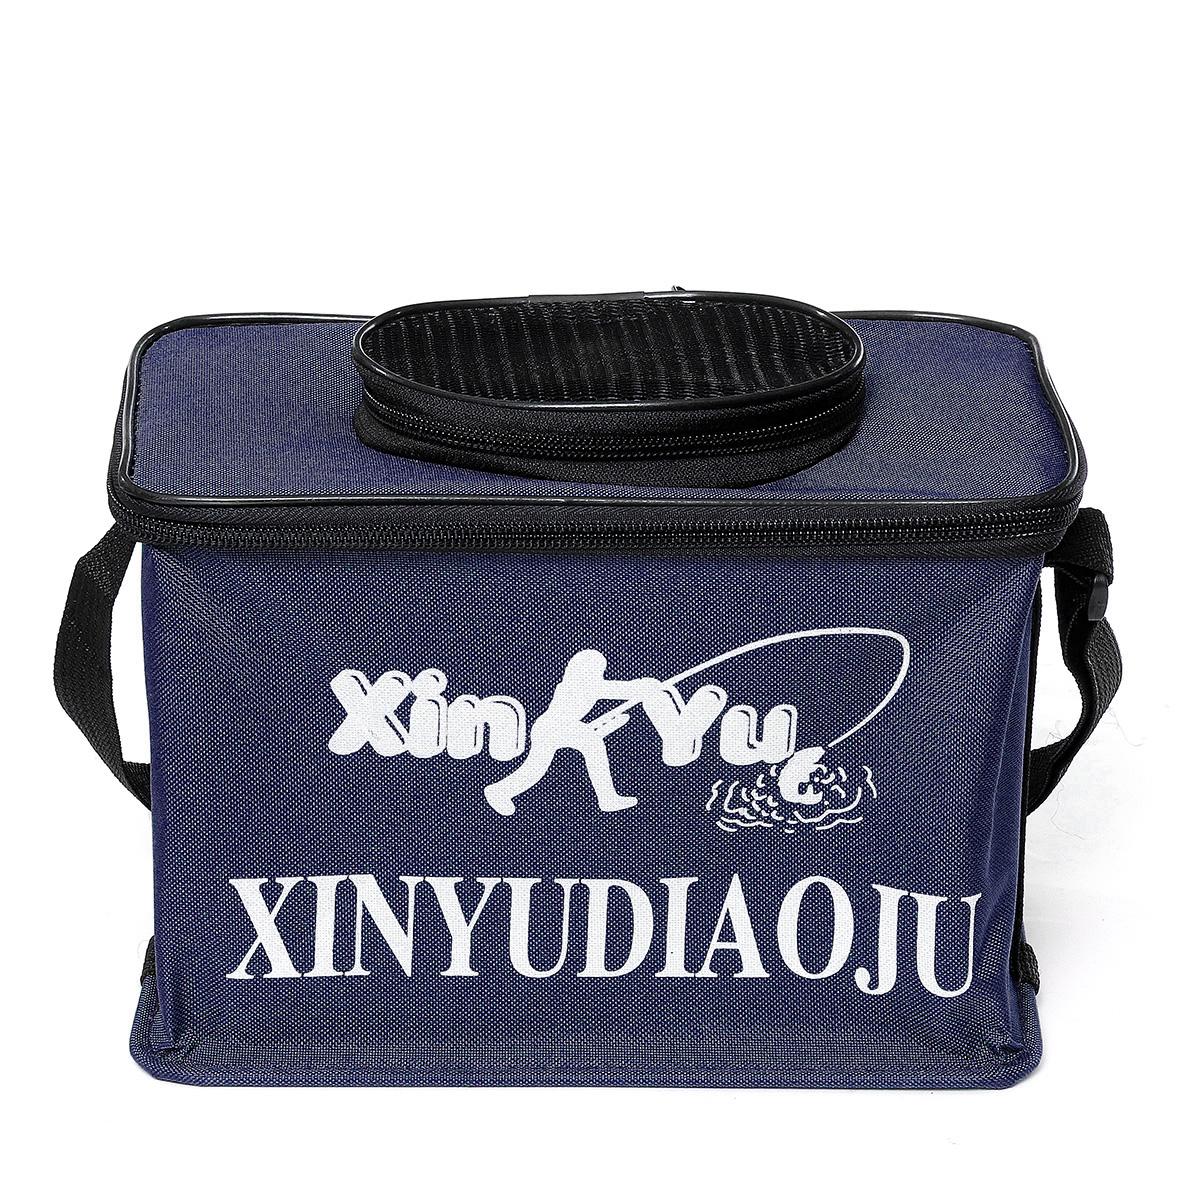 25x15x18cm Canvas Waterproof Fishing Bag Fishing Lure Bag Multifunctional Portable Shoulder Bag